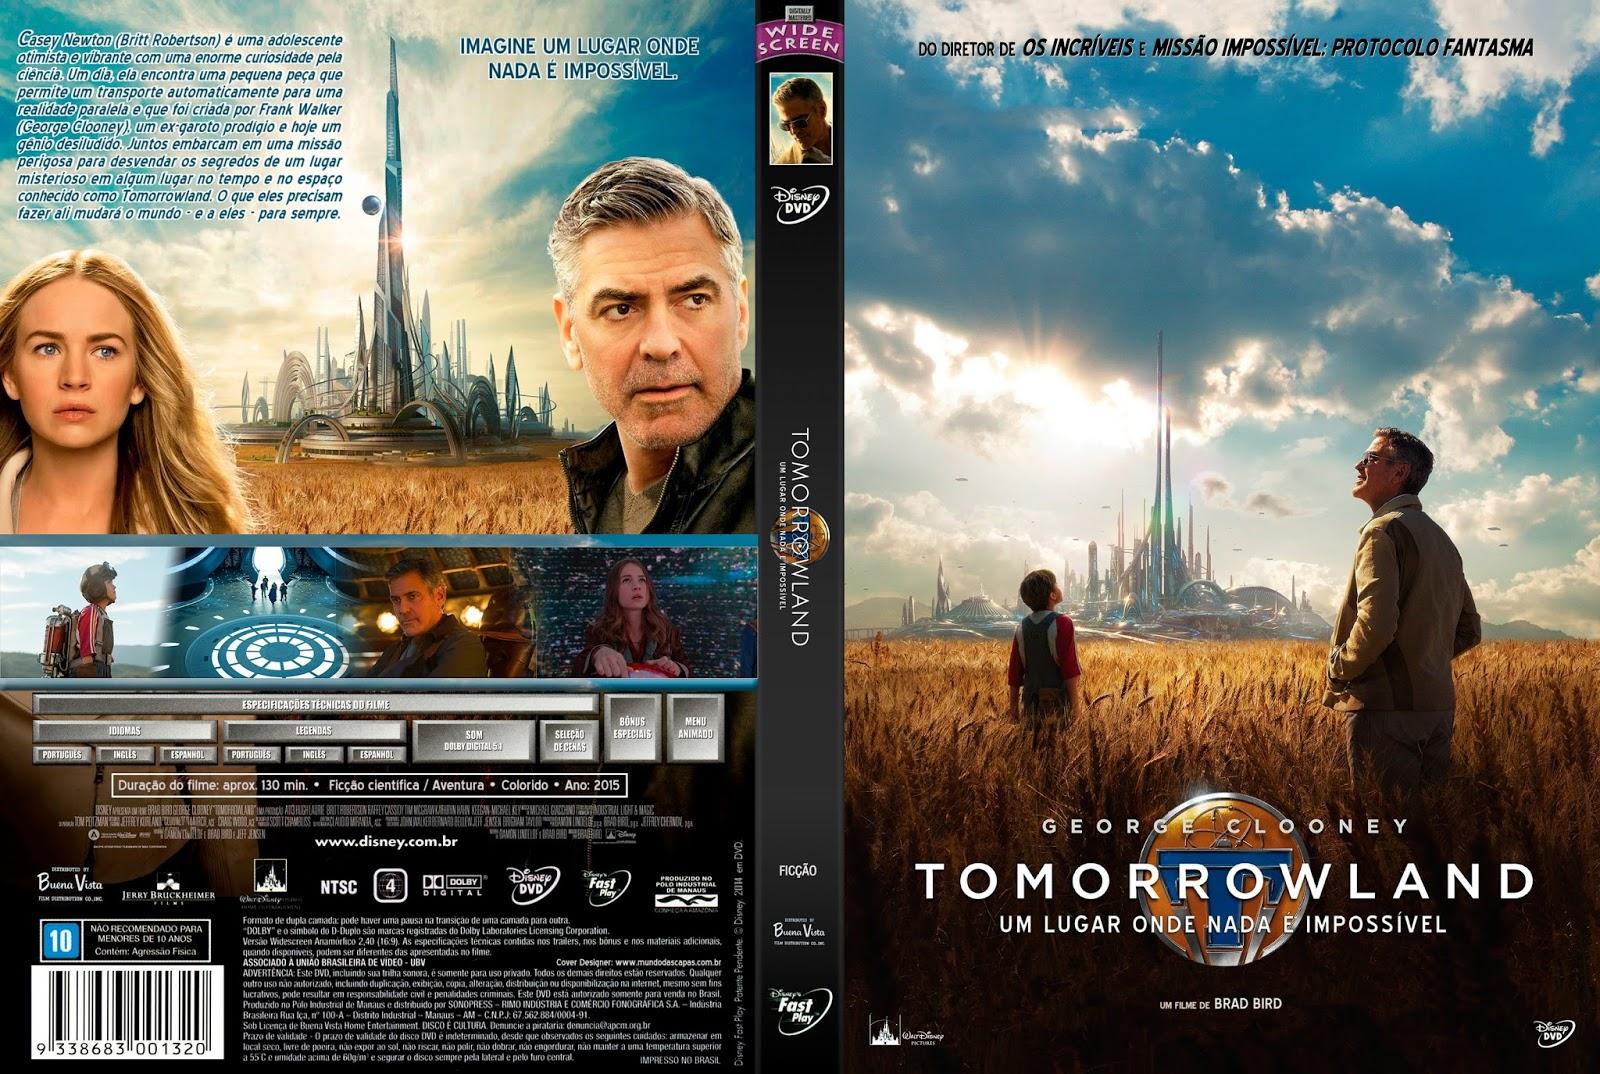 https://3.bp.blogspot.com/-XMCLSDd04_U/VYKG1w_WvII/AAAAAAAARLg/enW_6AeQ6f0/s1600/Tomorrowland%2Bum%2Blugar%2Bonde%2Bnada%2Be%2Bimpossivel.jpg